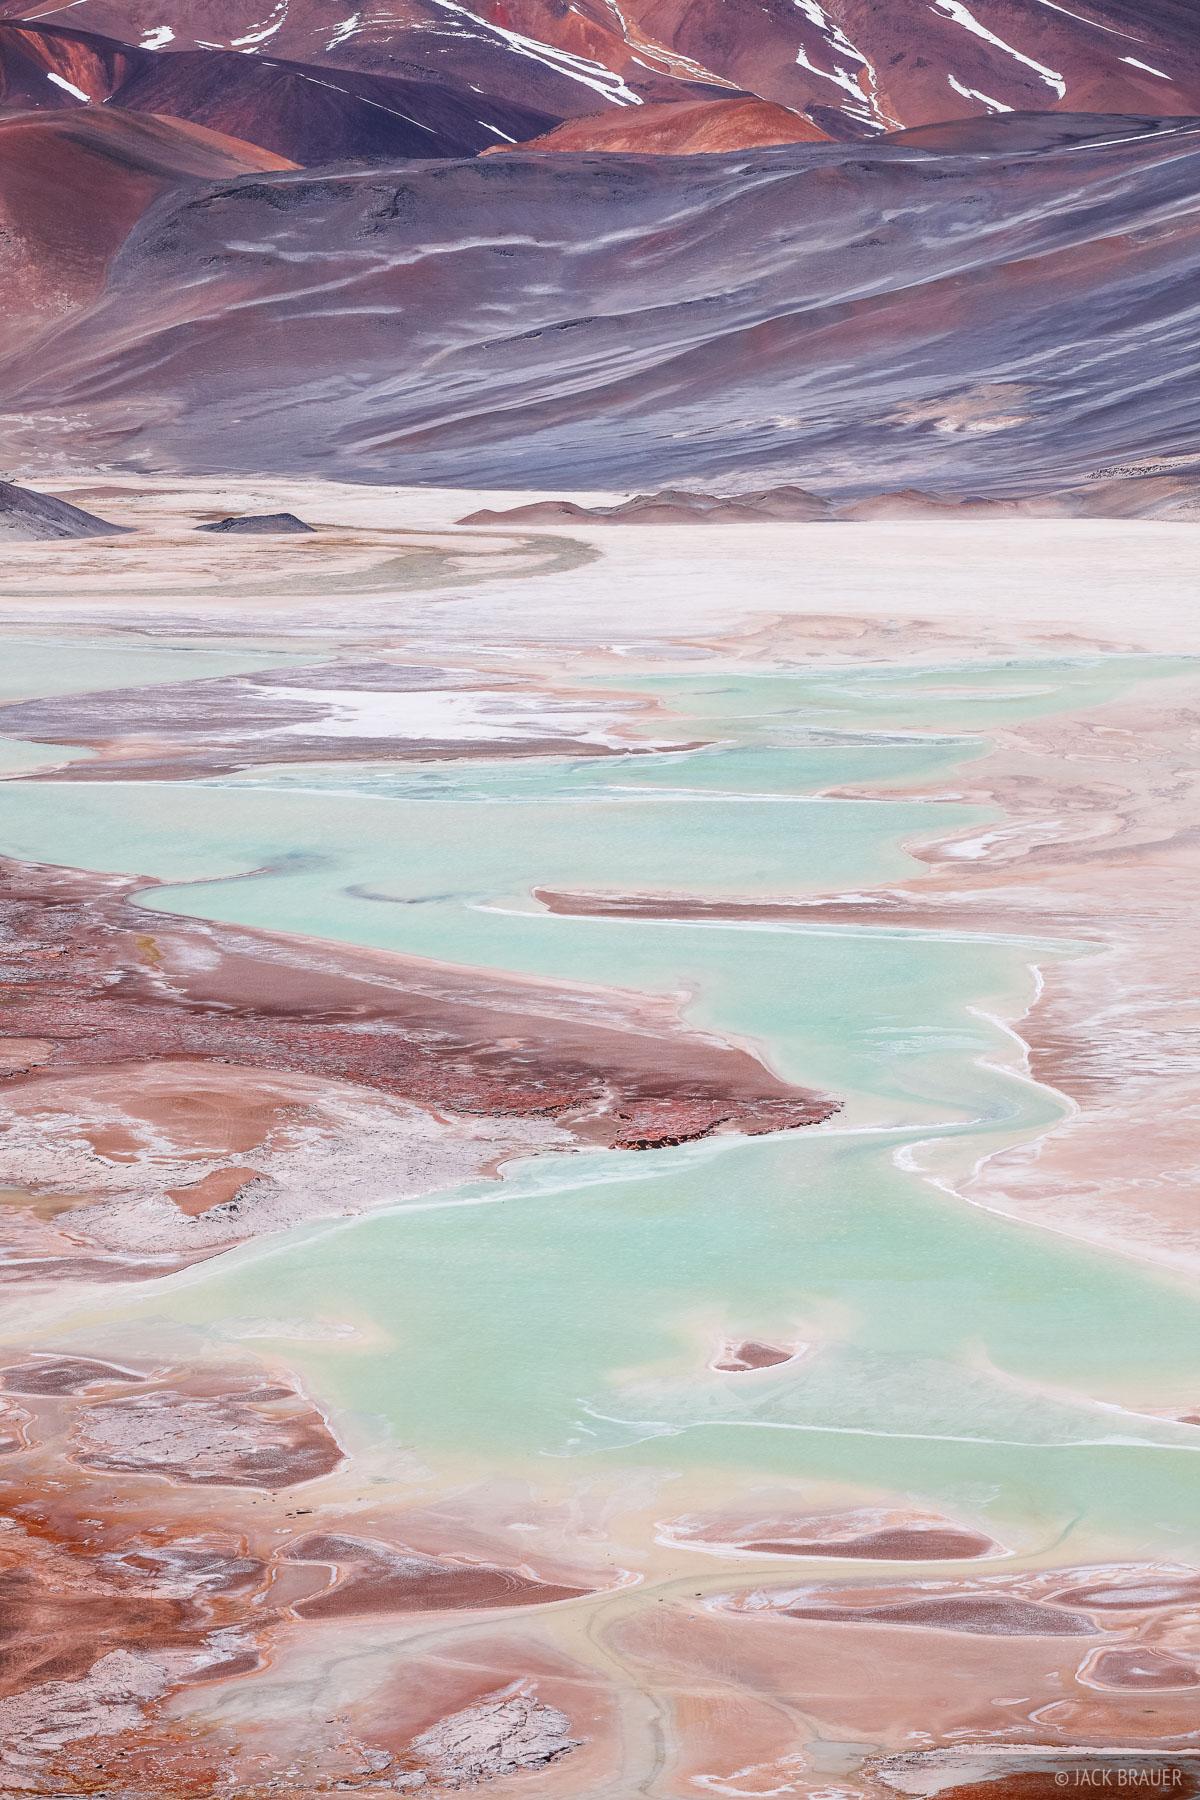 Surreal forms of Salar de Aguas Calientes.